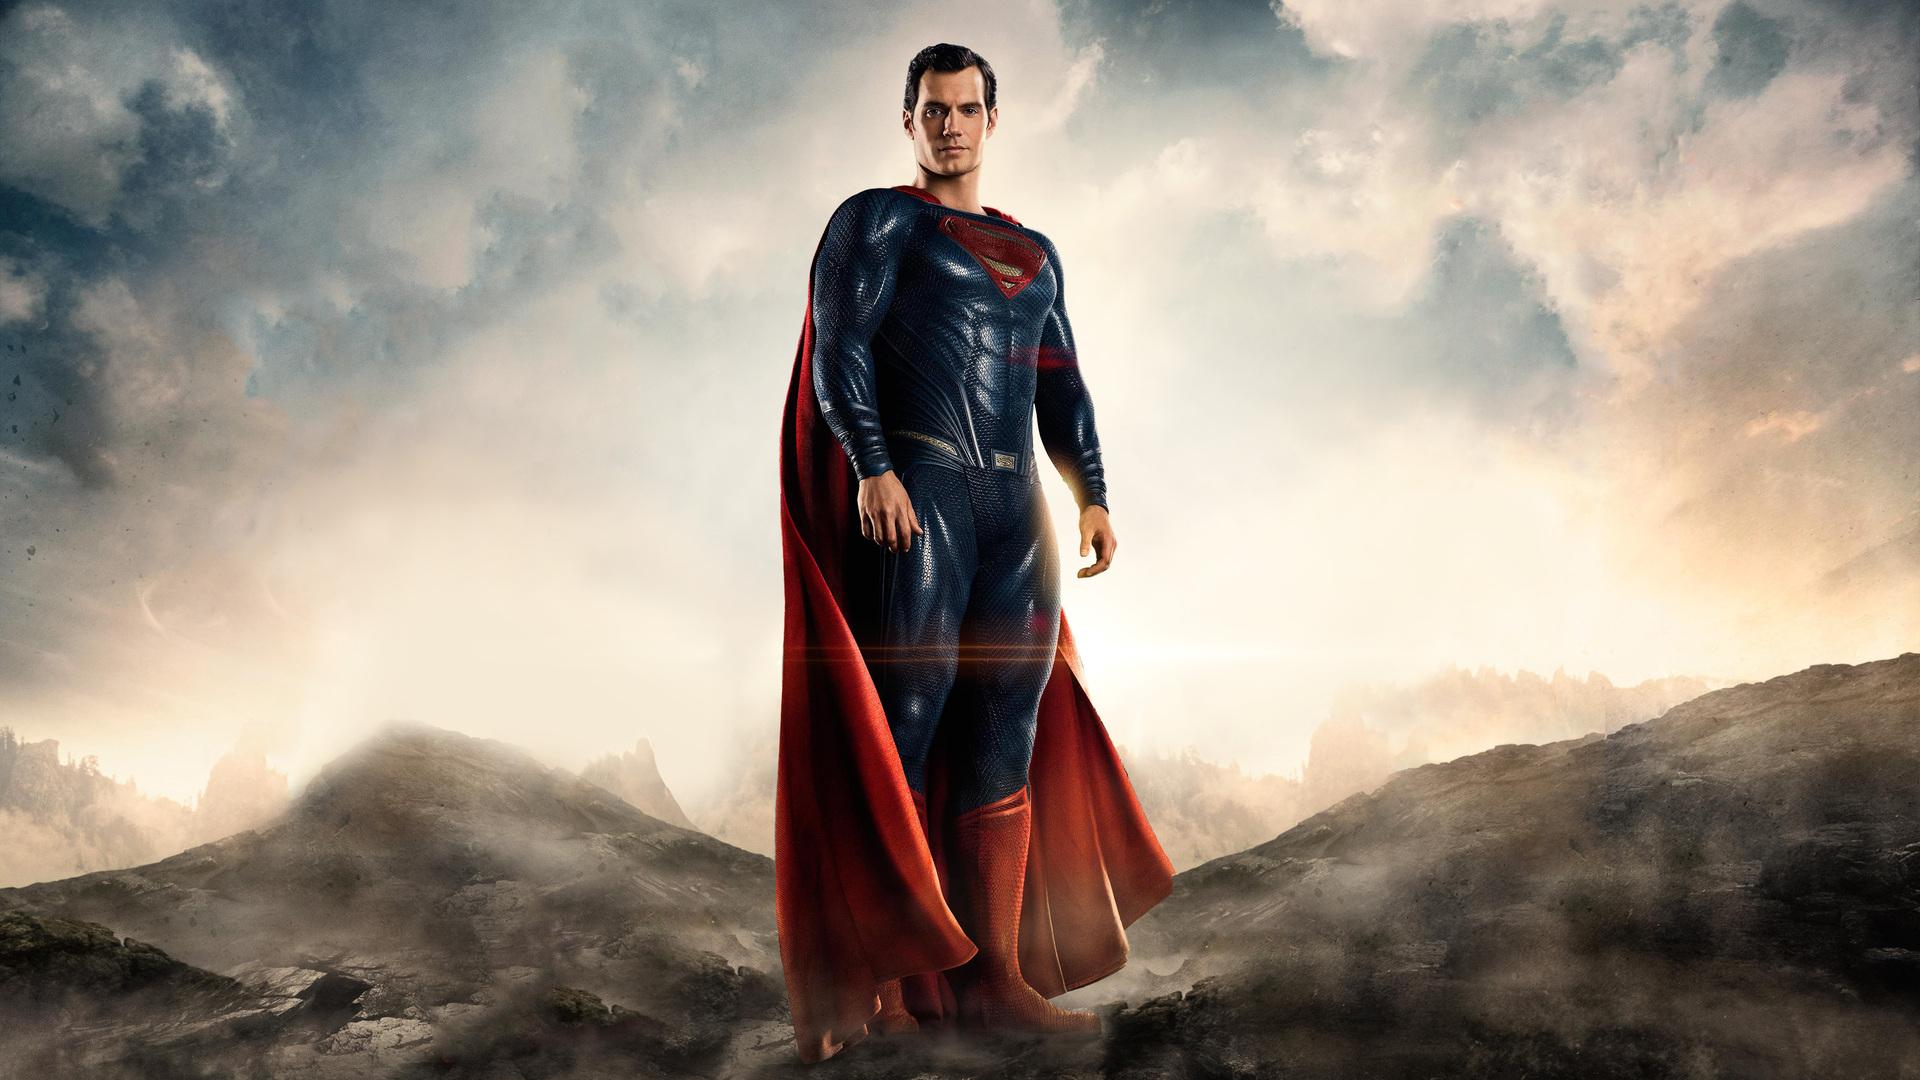 Justice League 2017 Movie 4k Hd Desktop Wallpaper For 4k: 1920x1080 Justice League Superman 4k Laptop Full HD 1080P